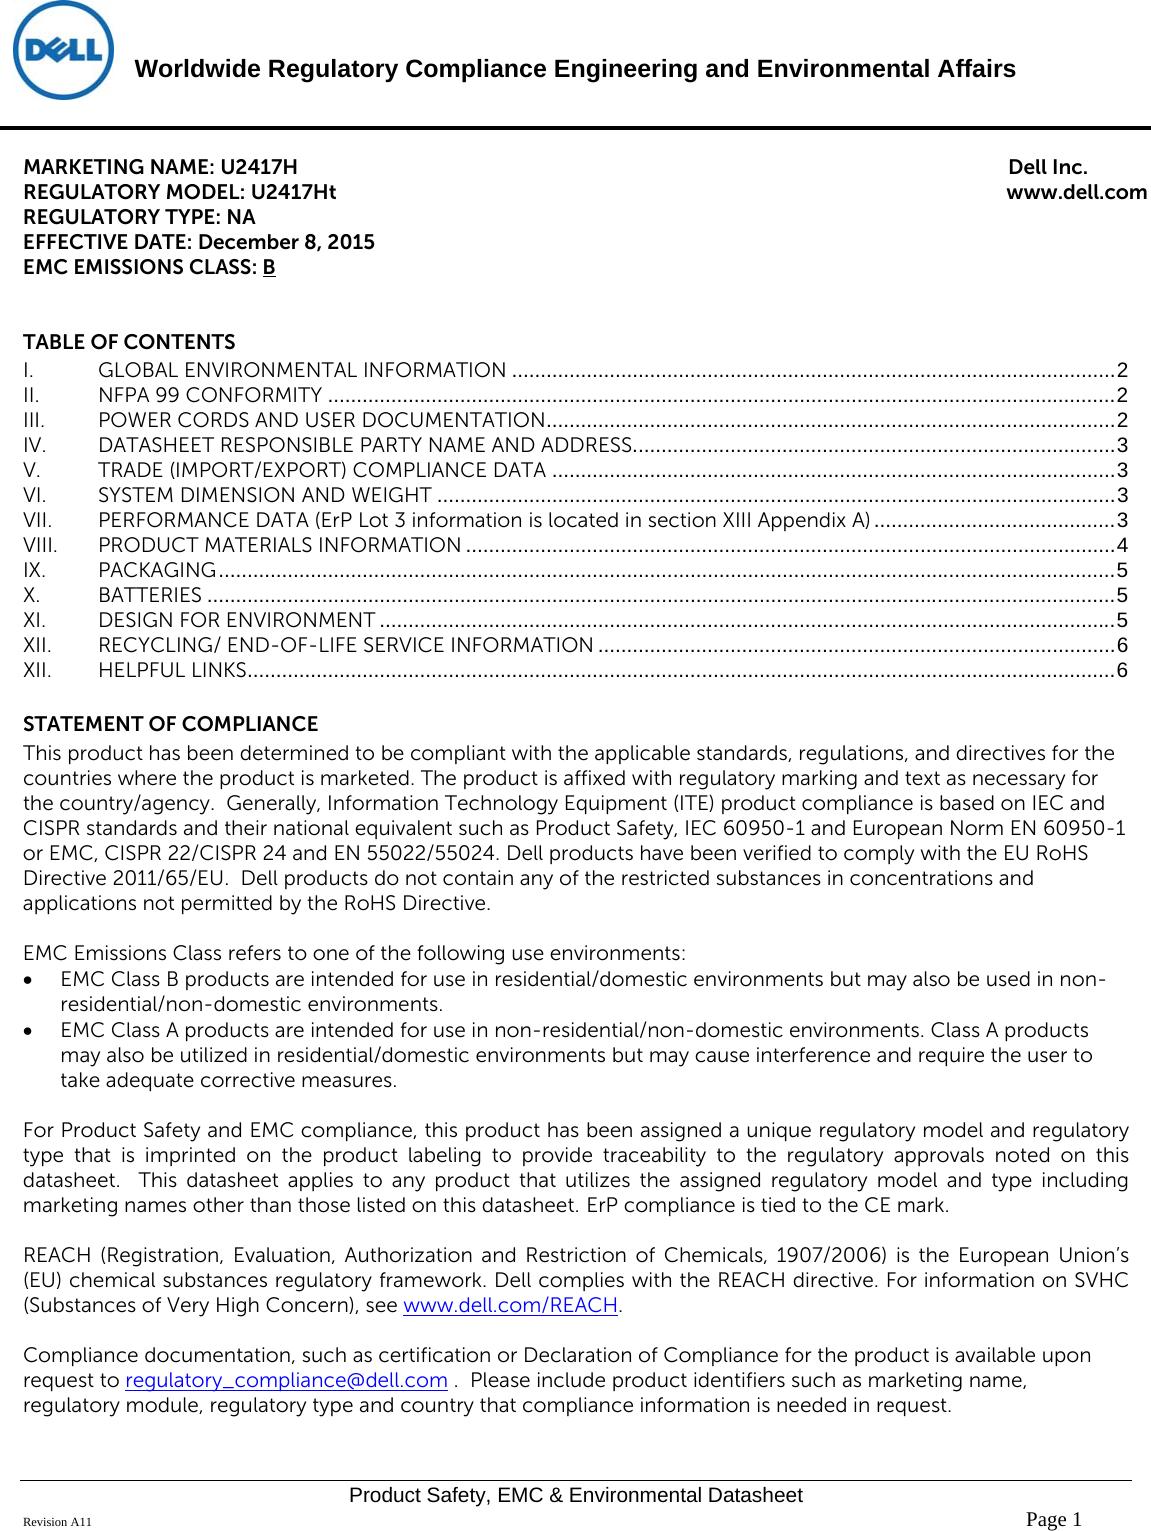 Dell U2417ha Monitor Disp U2417ht U2417h User Manual Regulatory And 4541 Datasheet Environmental U2417hau2417ht U2417han Adell